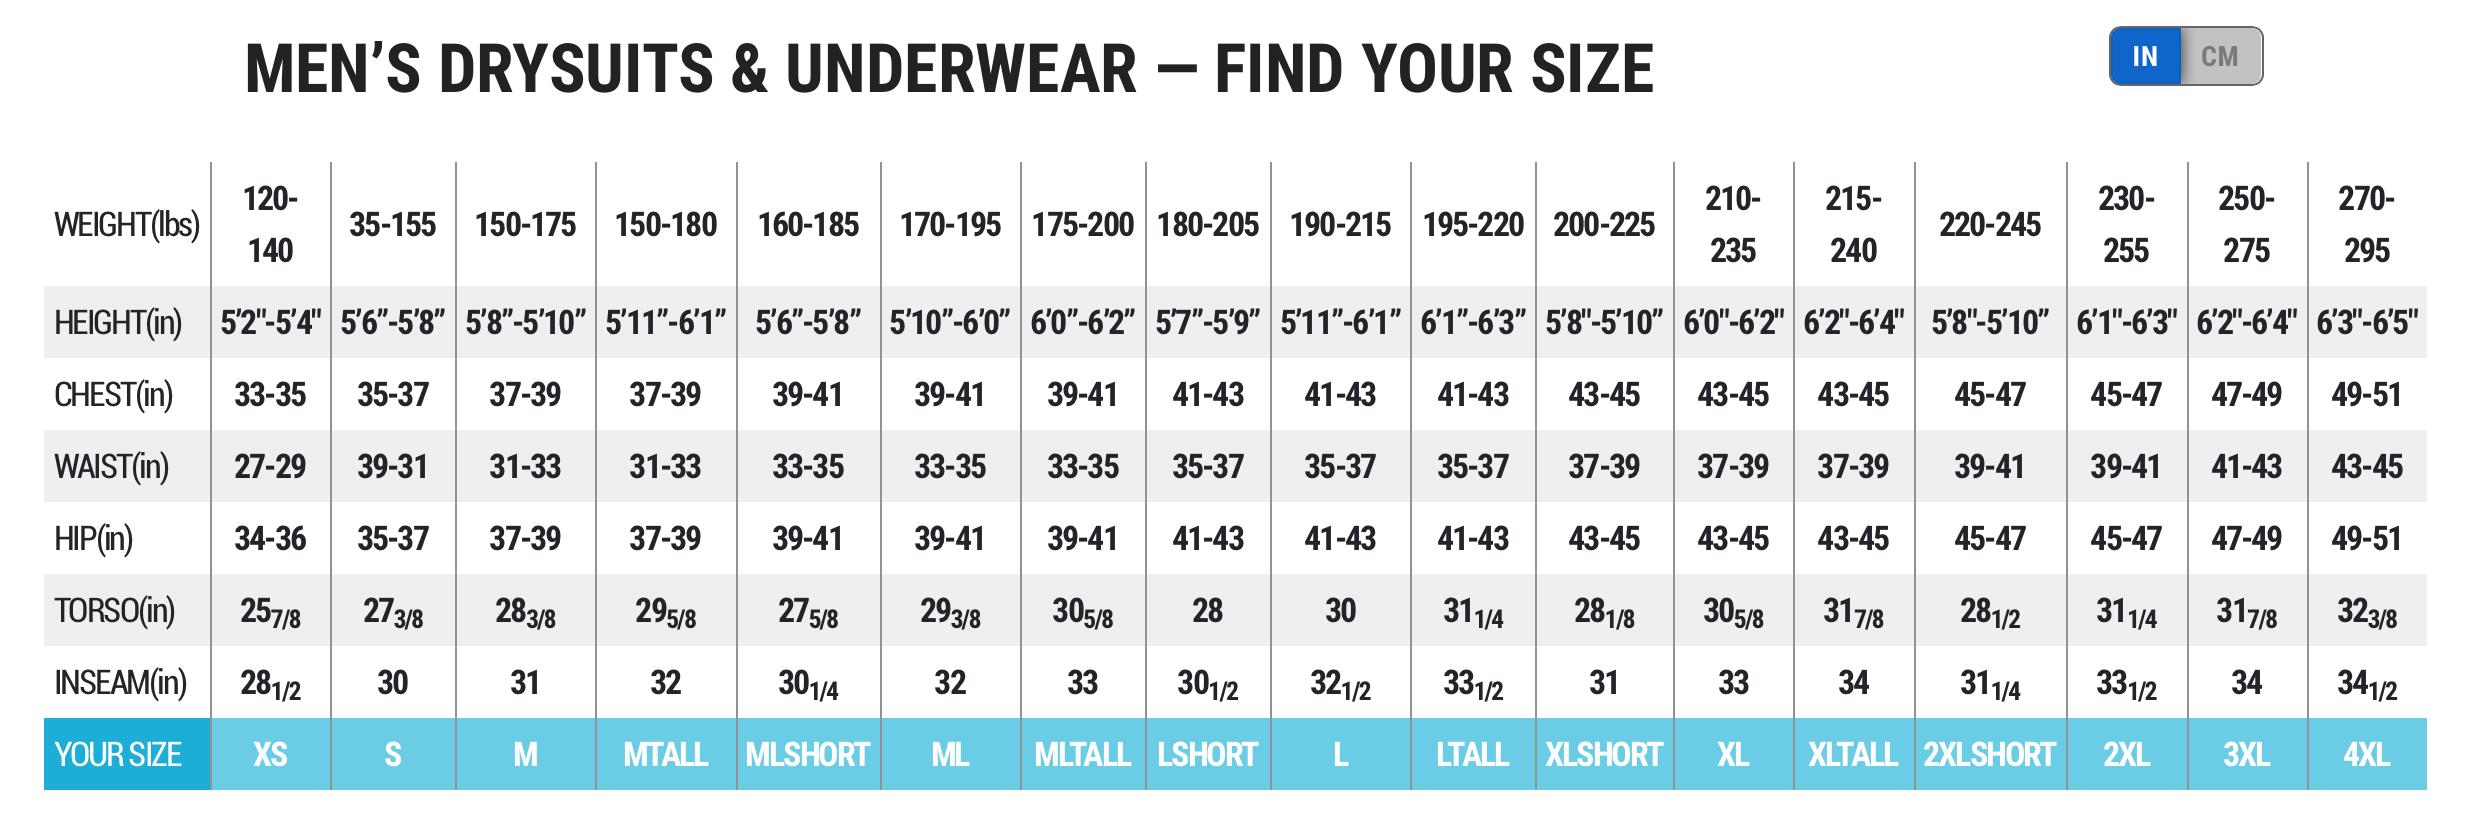 Female Size Chart for CT 200 Polarwear Undergarment -